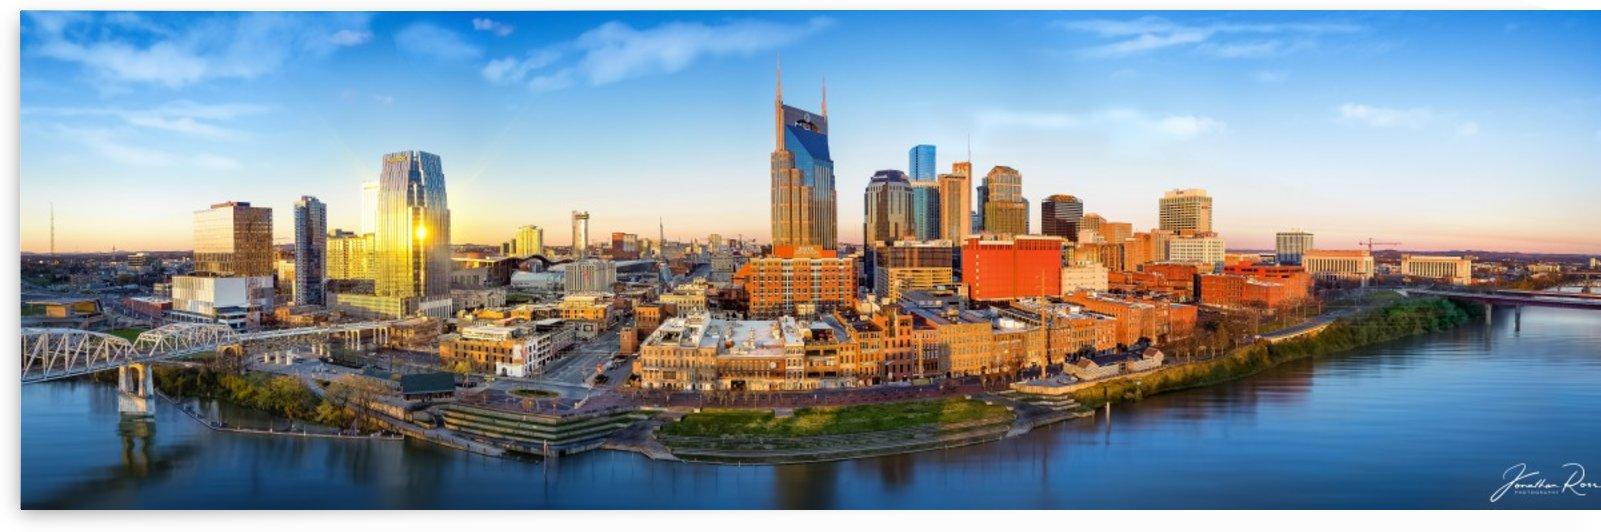 Nashville and morning sunrise by Jonathan Ross